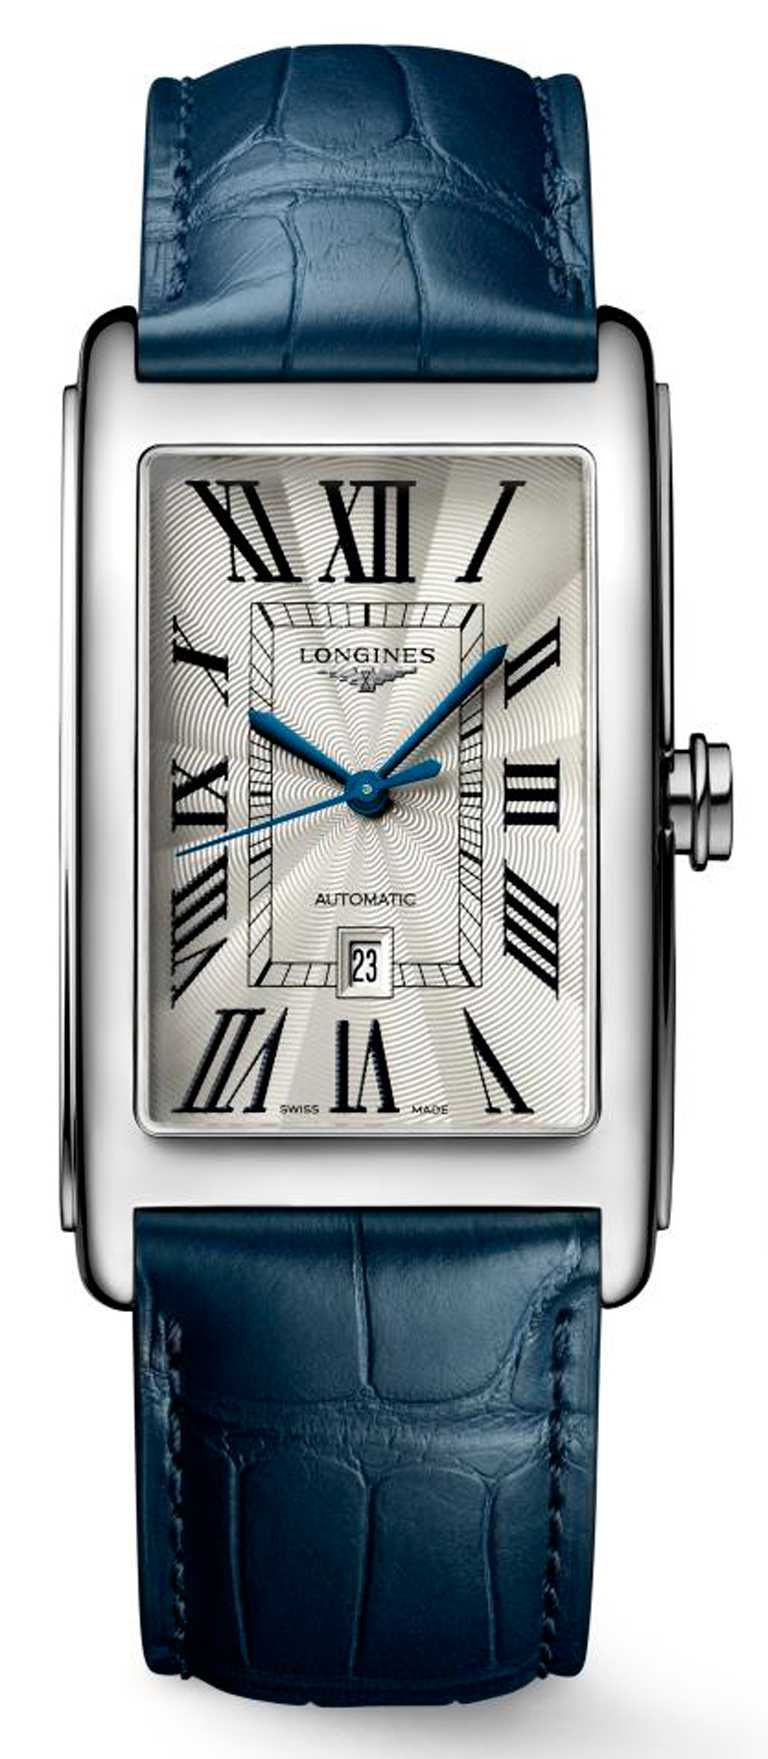 LONGINES「DolceVita多情」系列,銀色面盤羅馬時標男士腕錶,不鏽鋼錶殼,28.2 x47mm,L592自動上鏈機芯,藍色皮革錶帶╱51,900元。(圖╱LONGINES提供)